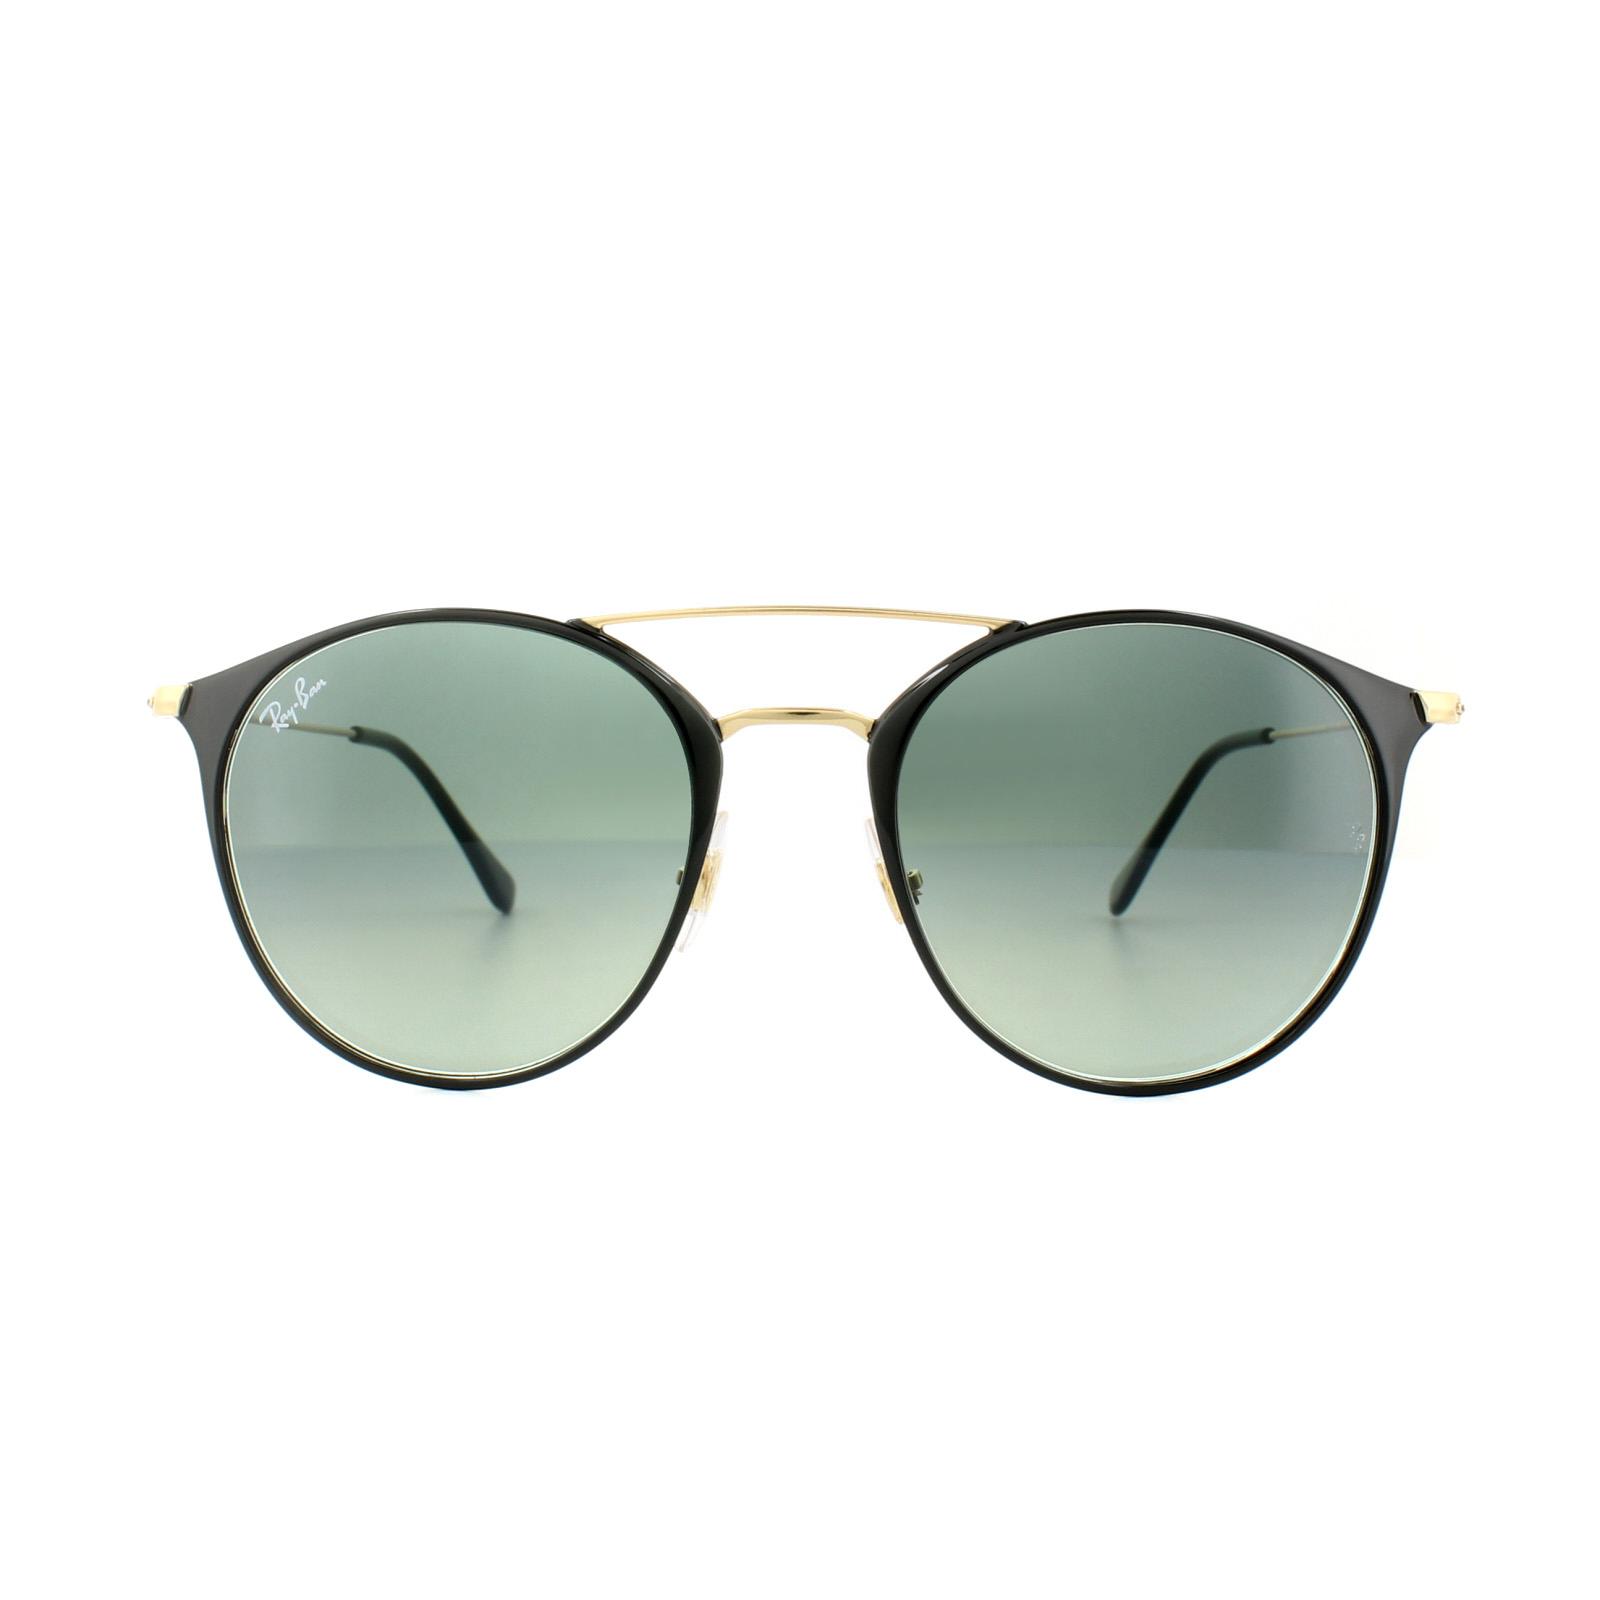 74206c4fd Sentinel Ray-Ban Sunglasses 3546 187/71 Black Gold Grey Gradient